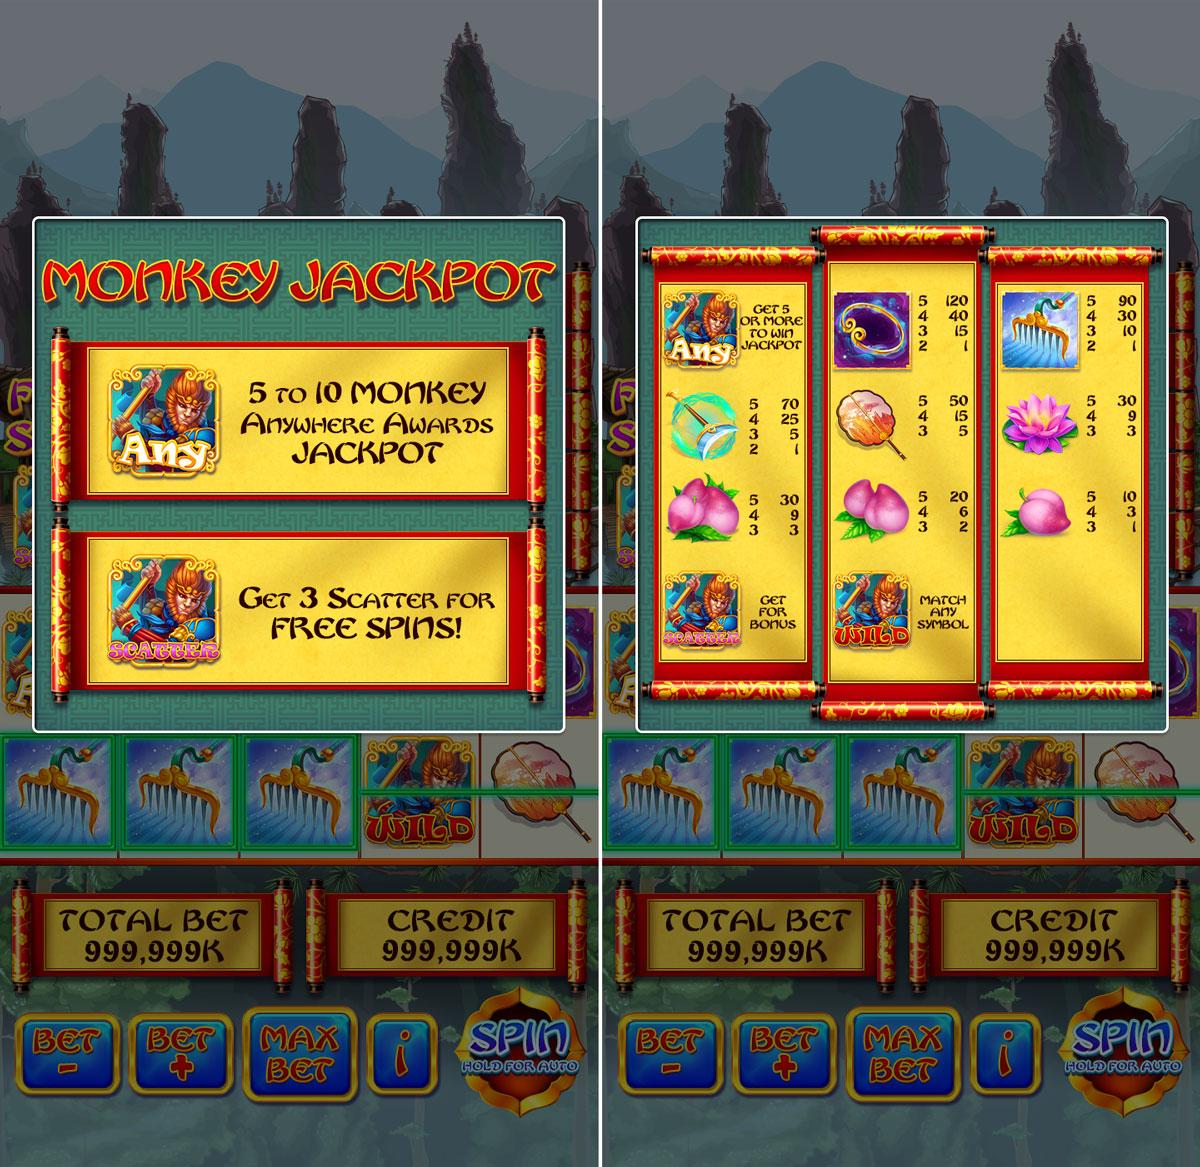 monkey_jackpot_rules